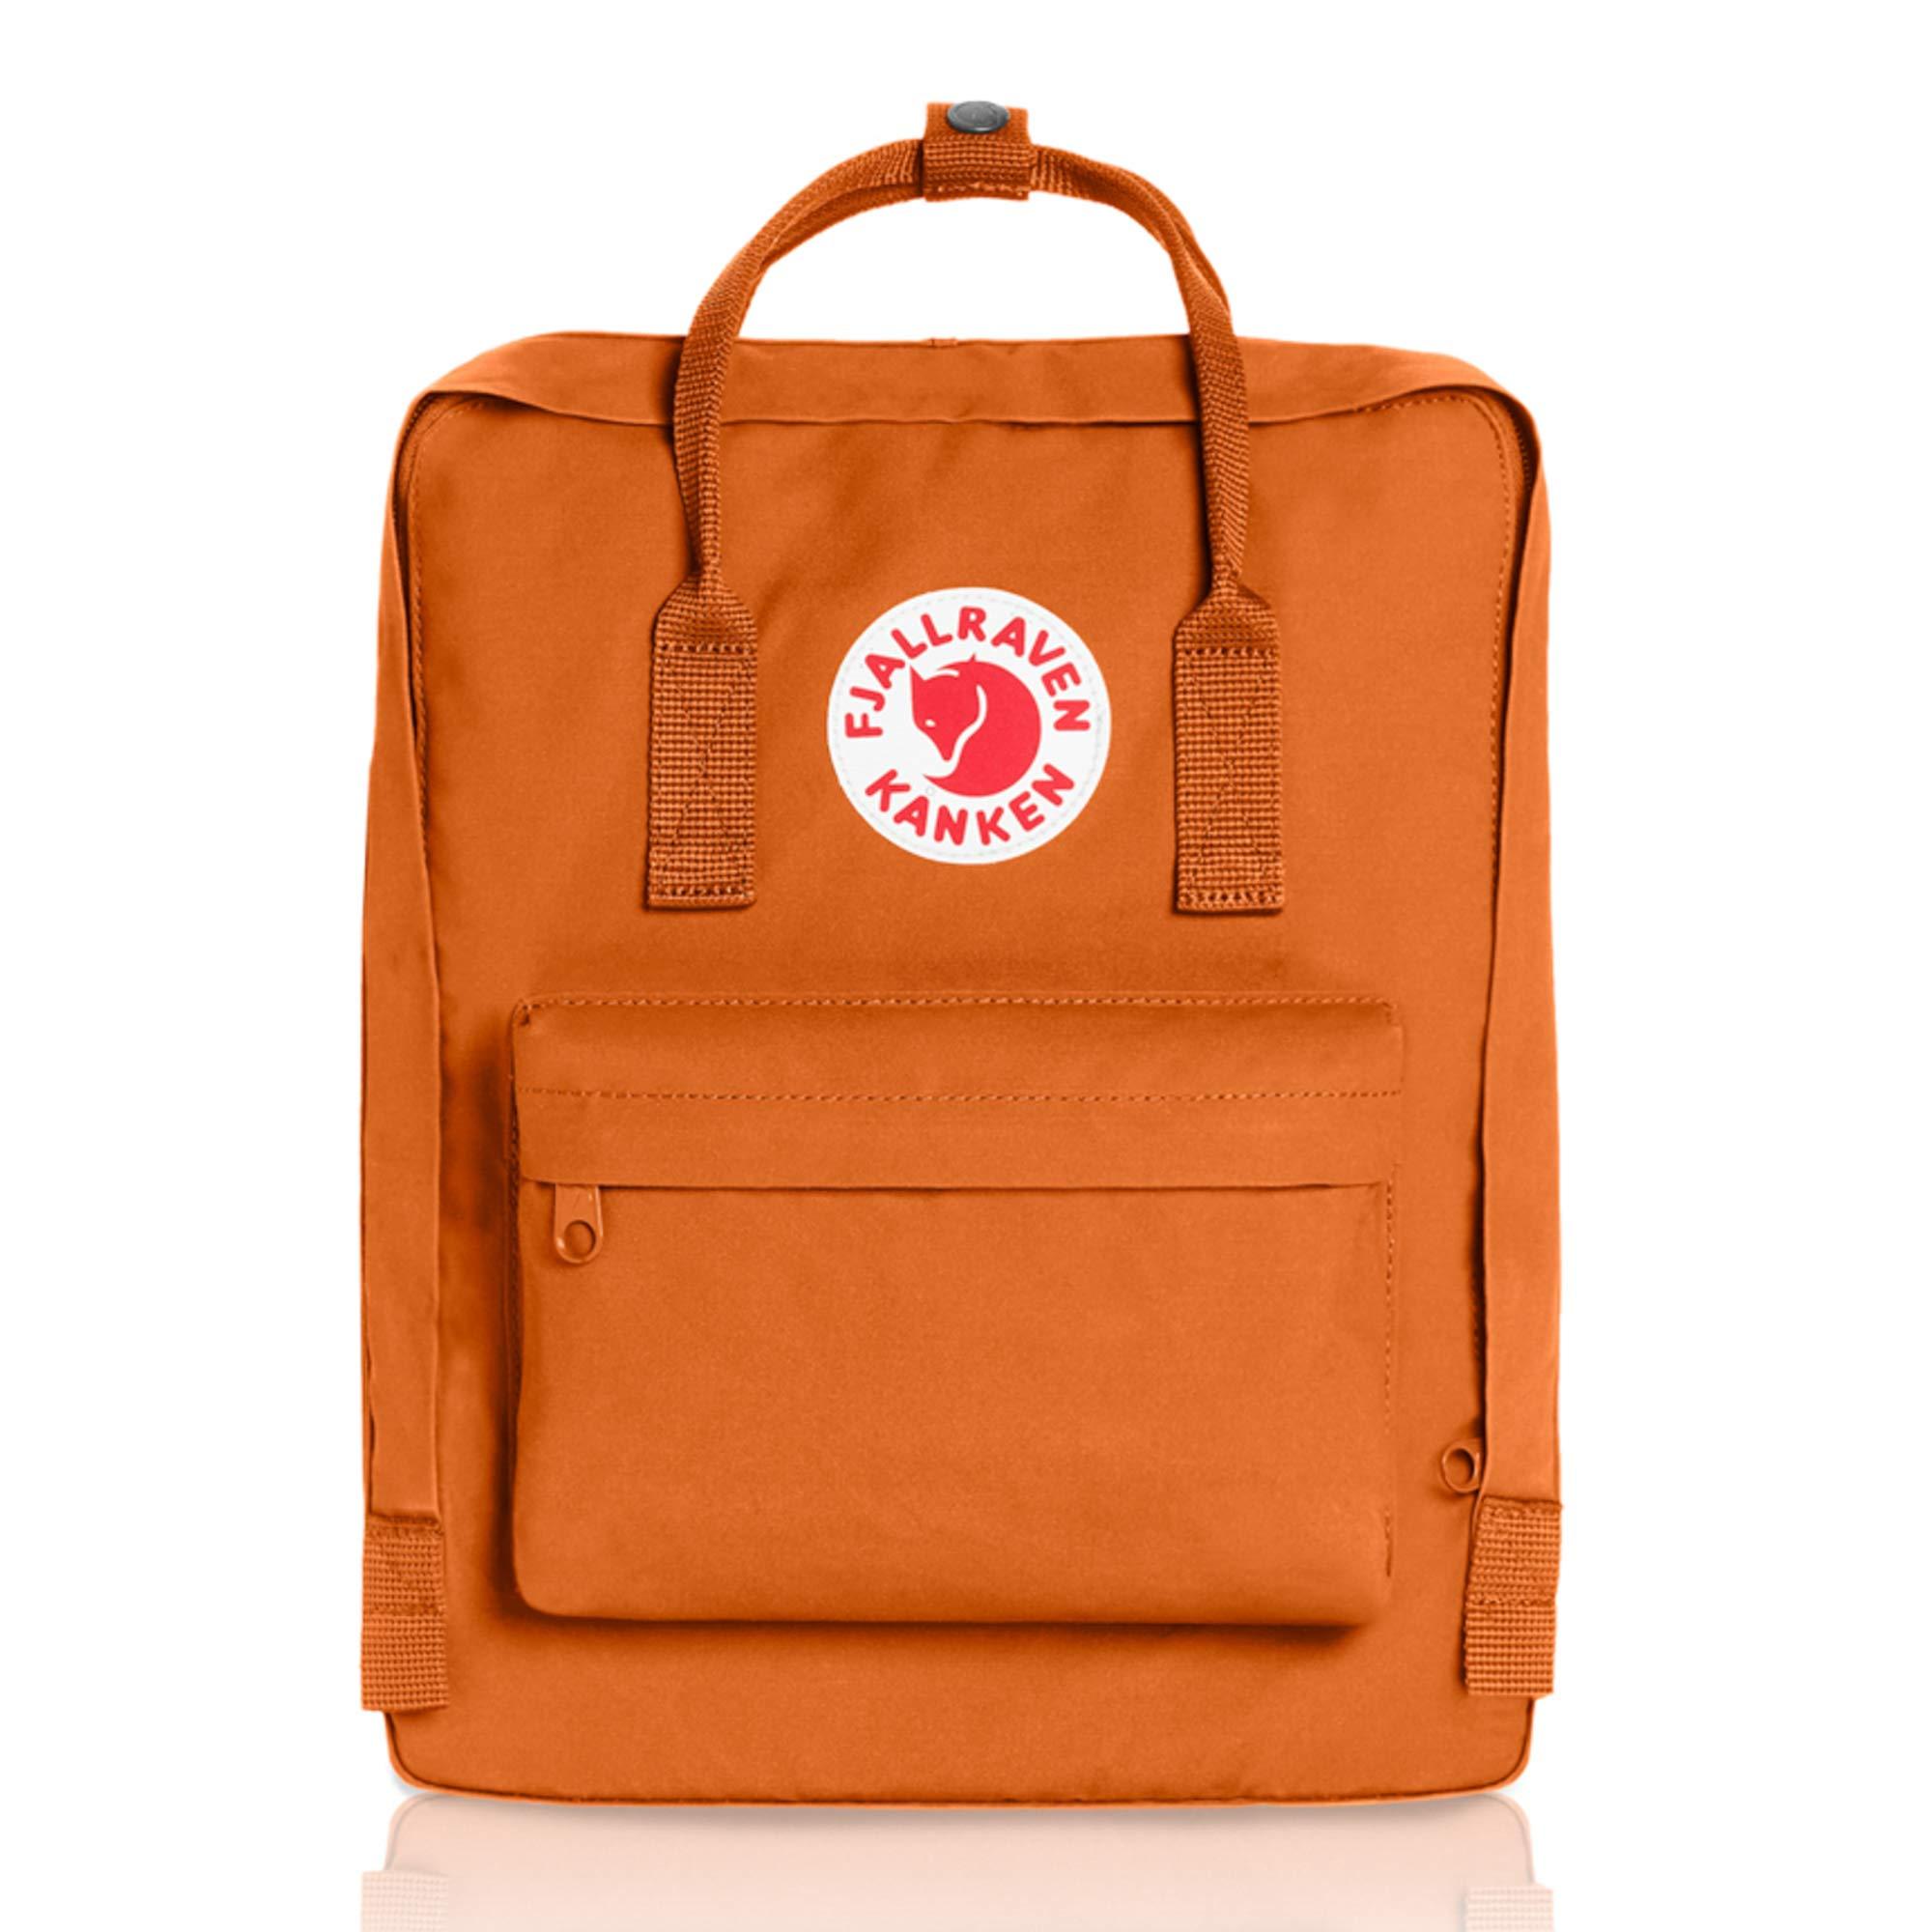 Fjallraven - Kanken Classic Backpack for Everyday, Brick by Fjallraven